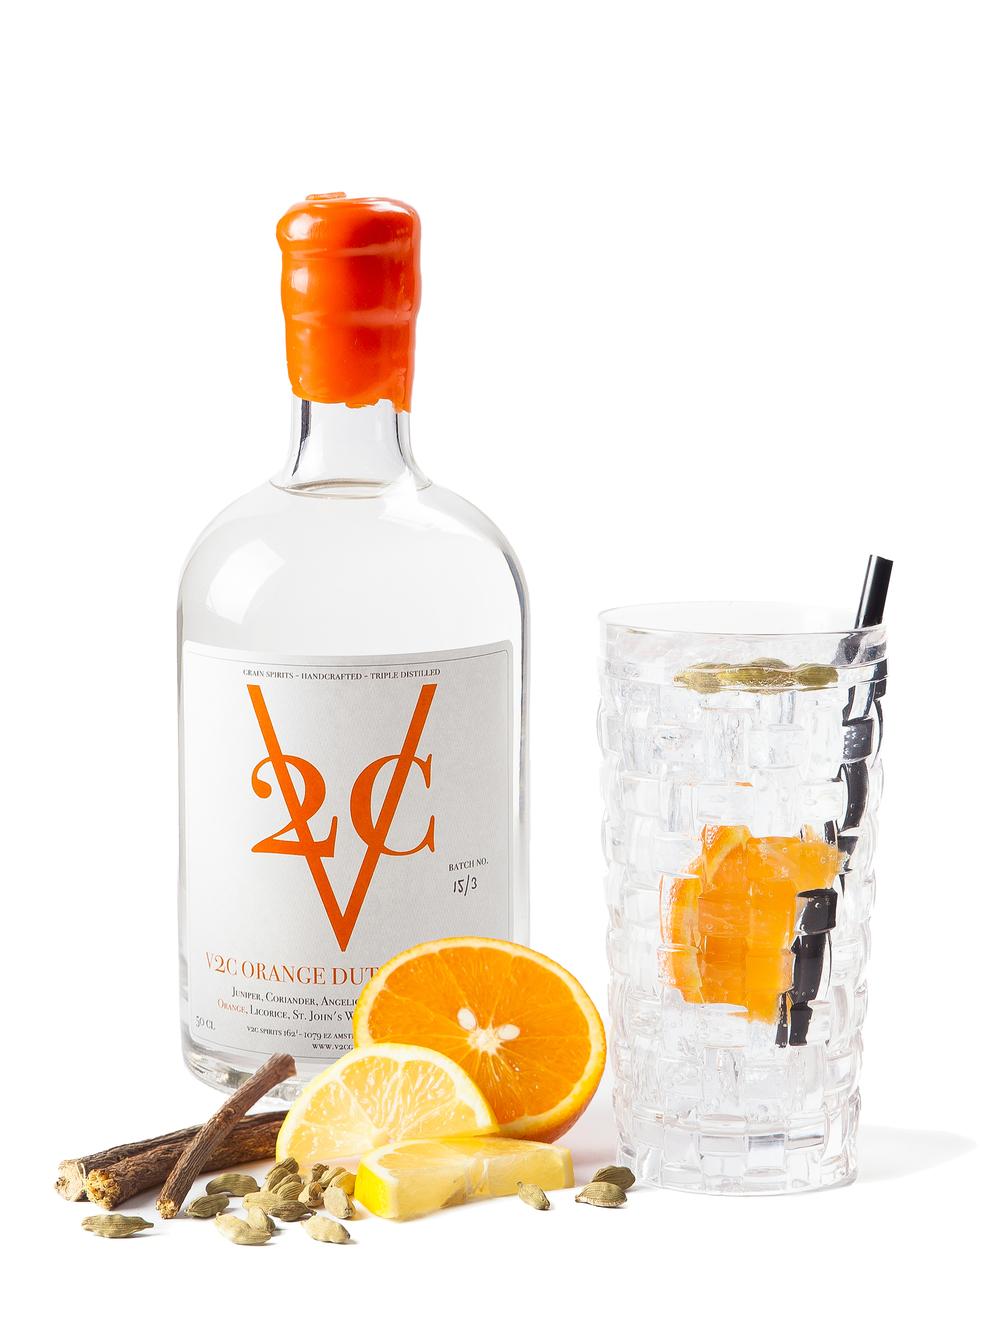 V2C-Orange-Dutch-Dry-Gin-Perfect-Serve